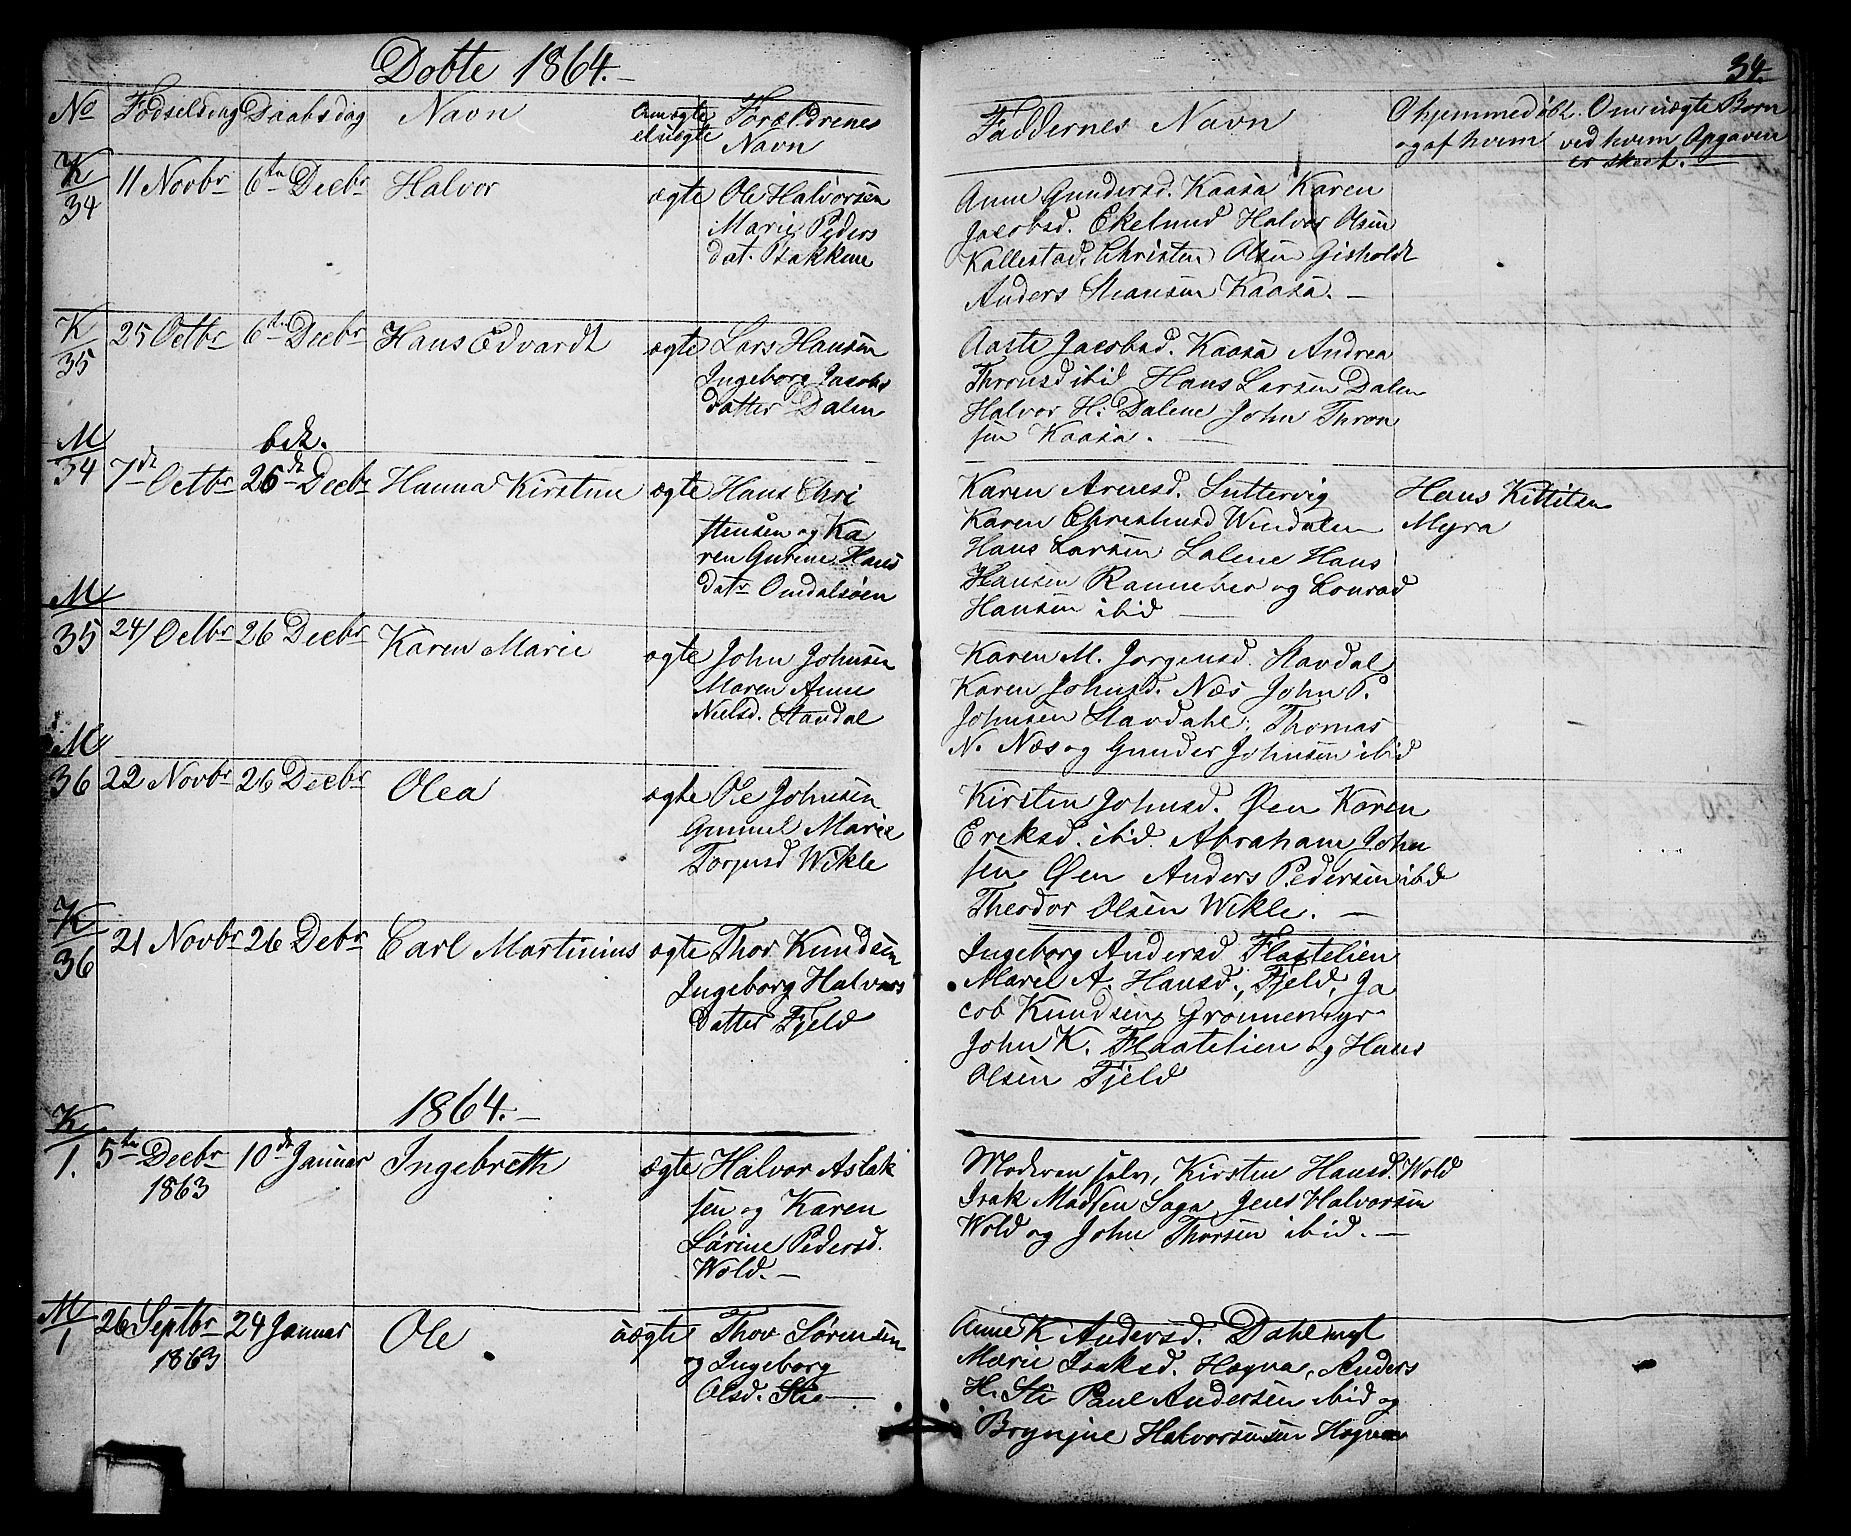 SAKO, Solum kirkebøker, G/Gb/L0002: Klokkerbok nr. II 2, 1859-1879, s. 34